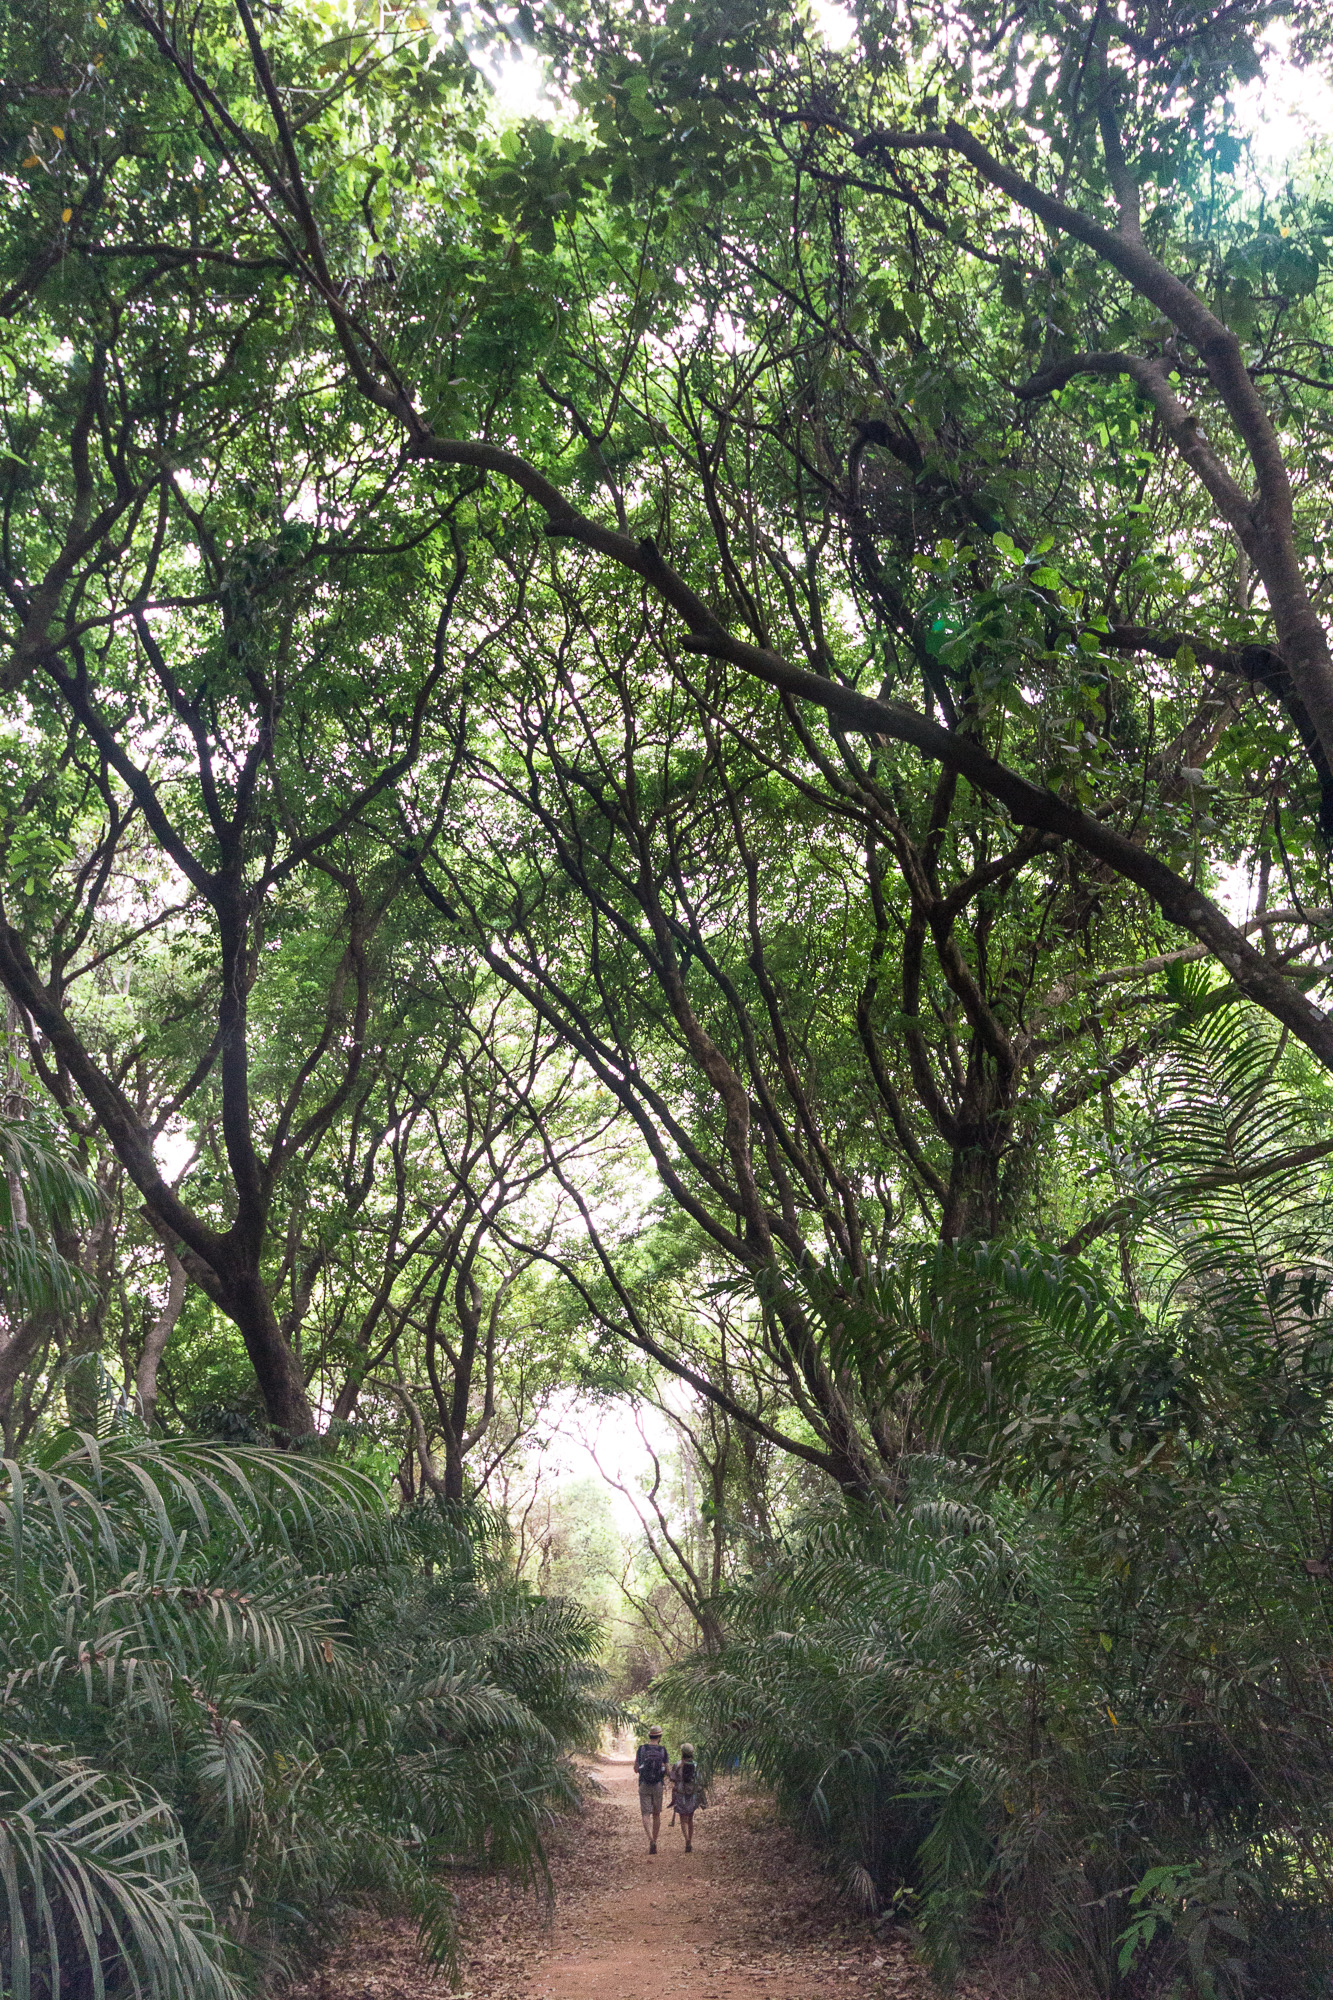 Grands arbres de la forêt-galerie de Kou, Burkina Faso